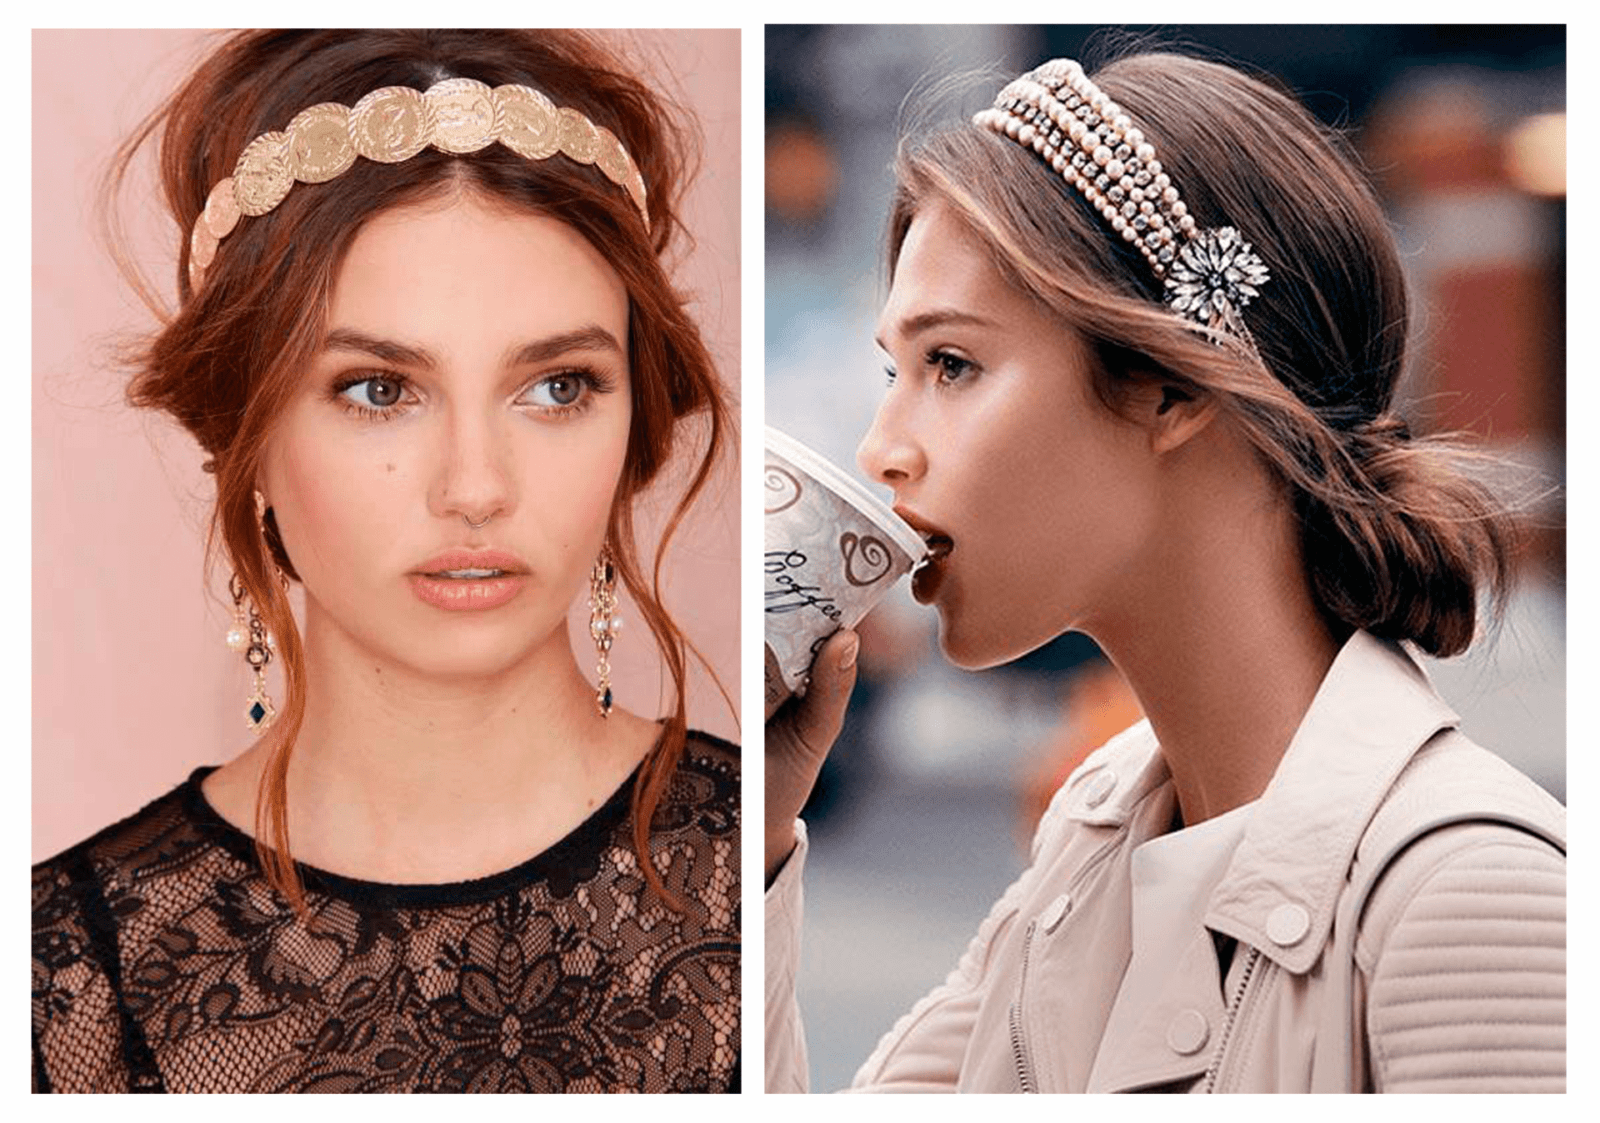 hairband headband haarband become again a super fashion trend